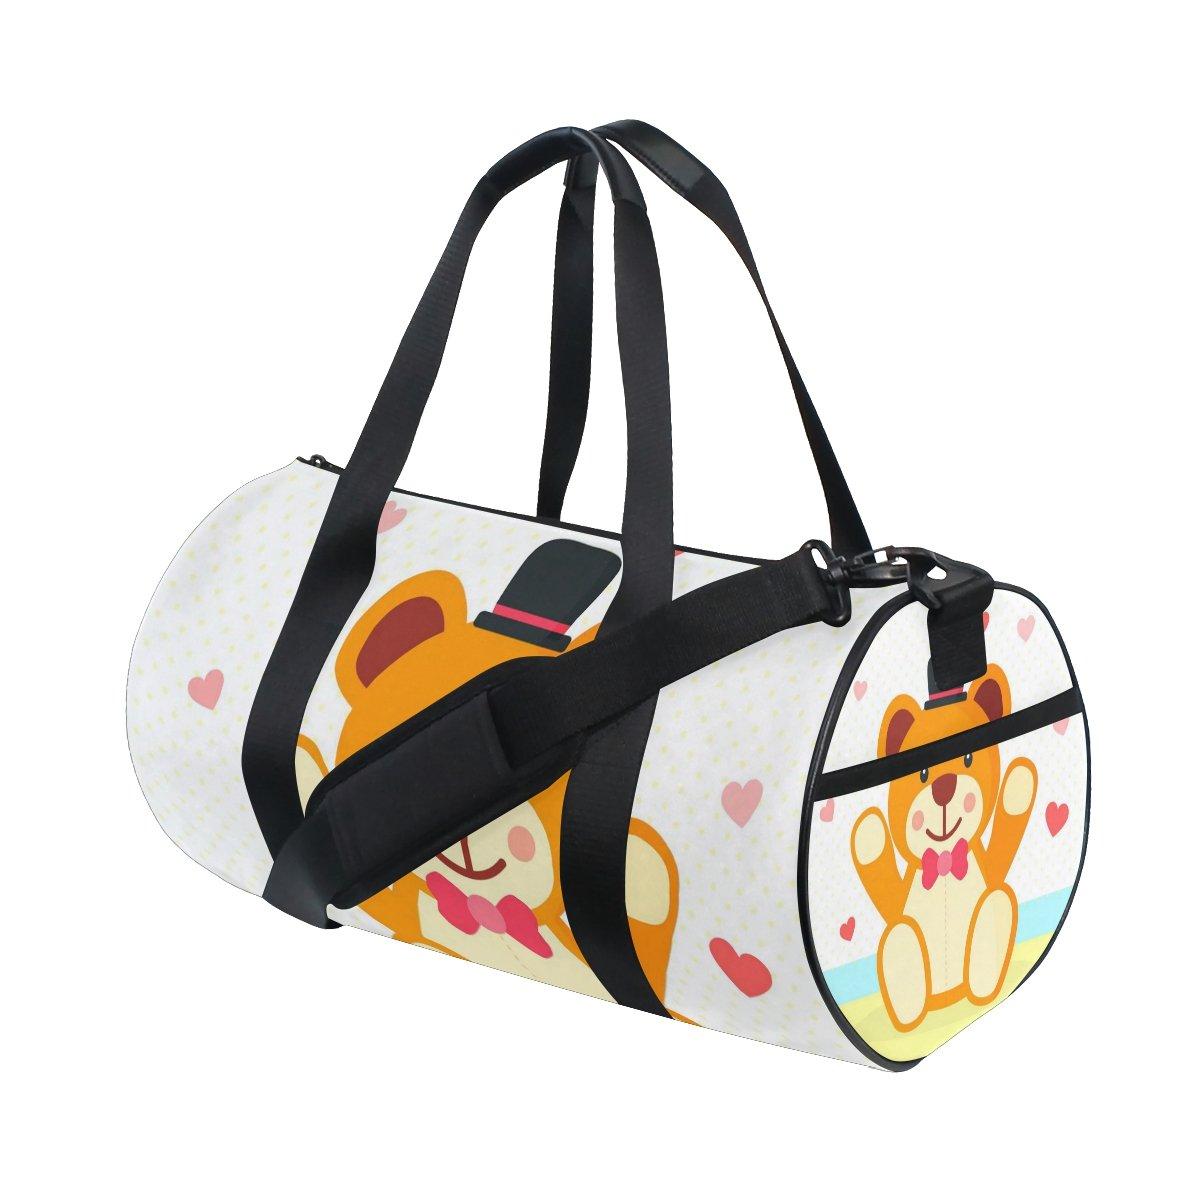 Anime Cartoon Cute Teddy Bear Lightweight Canvas Sports Bag Travel Duffel Bags